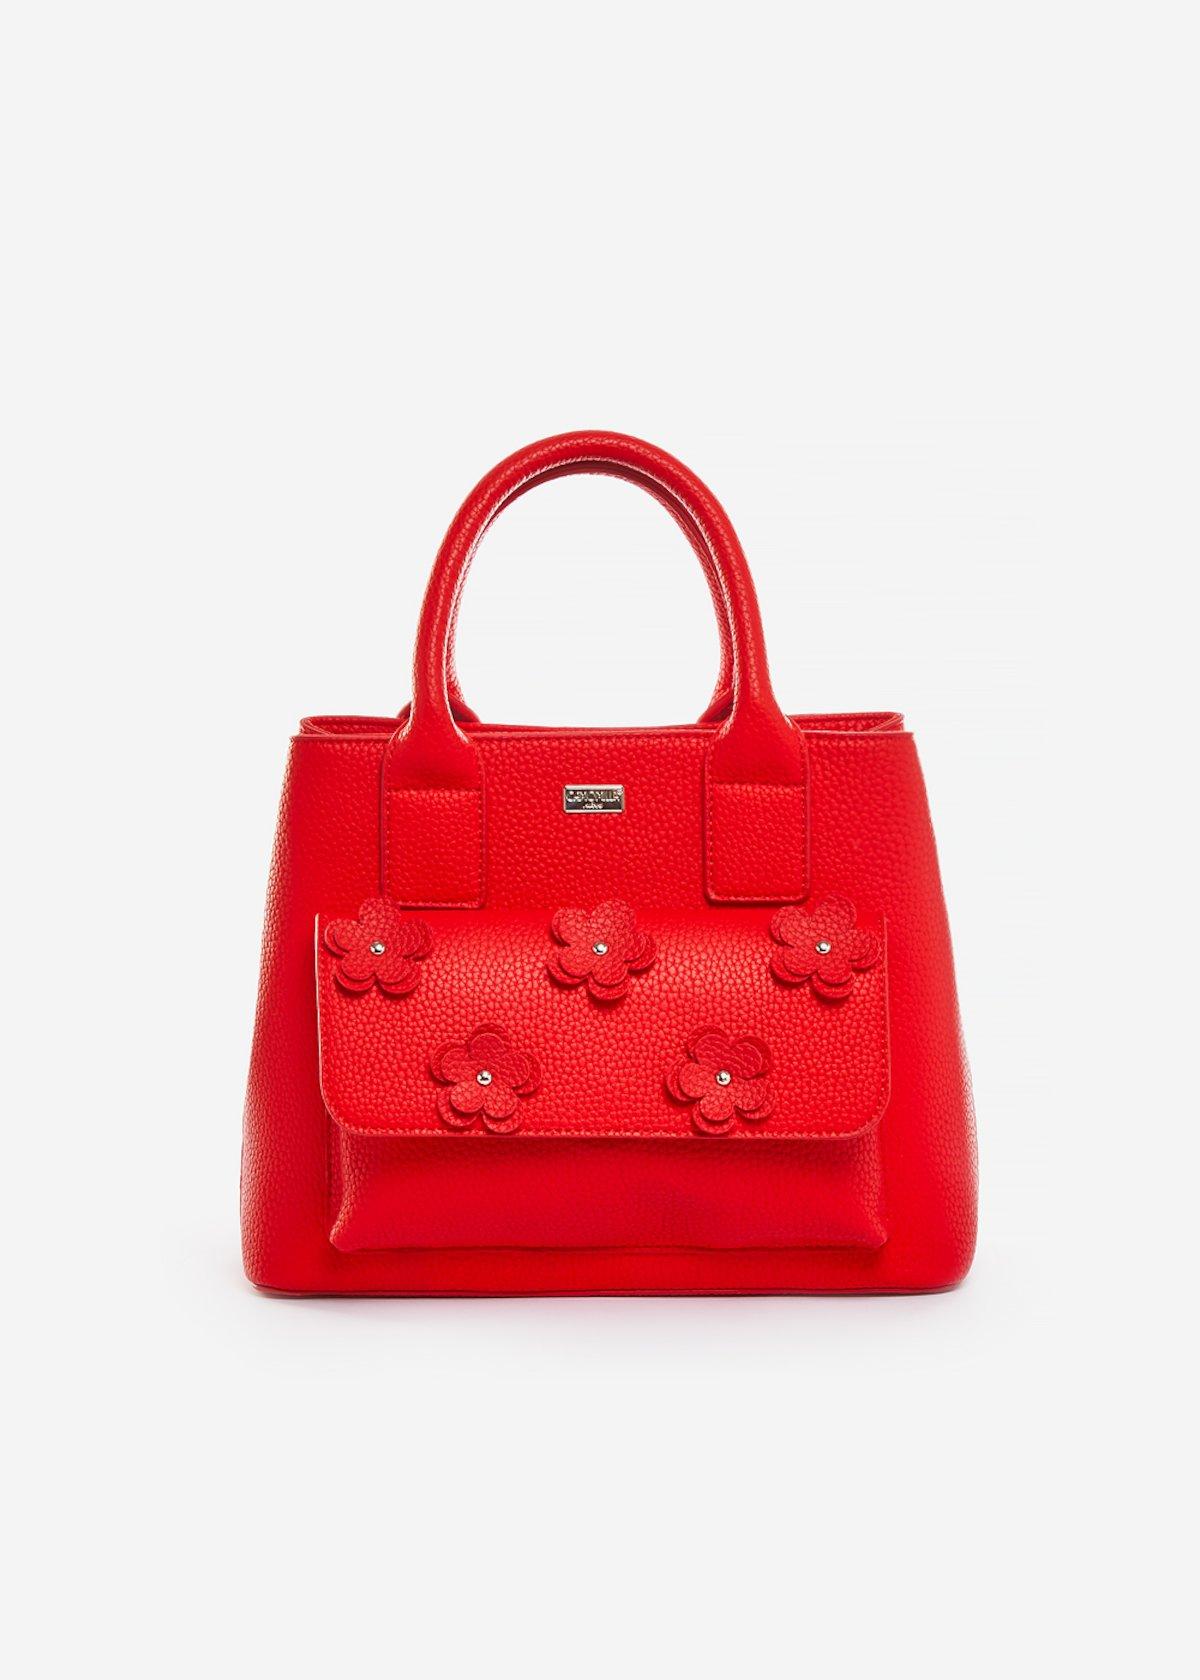 Shopping bag Beatris in ecopelle con dettaglio flowers - Poppy